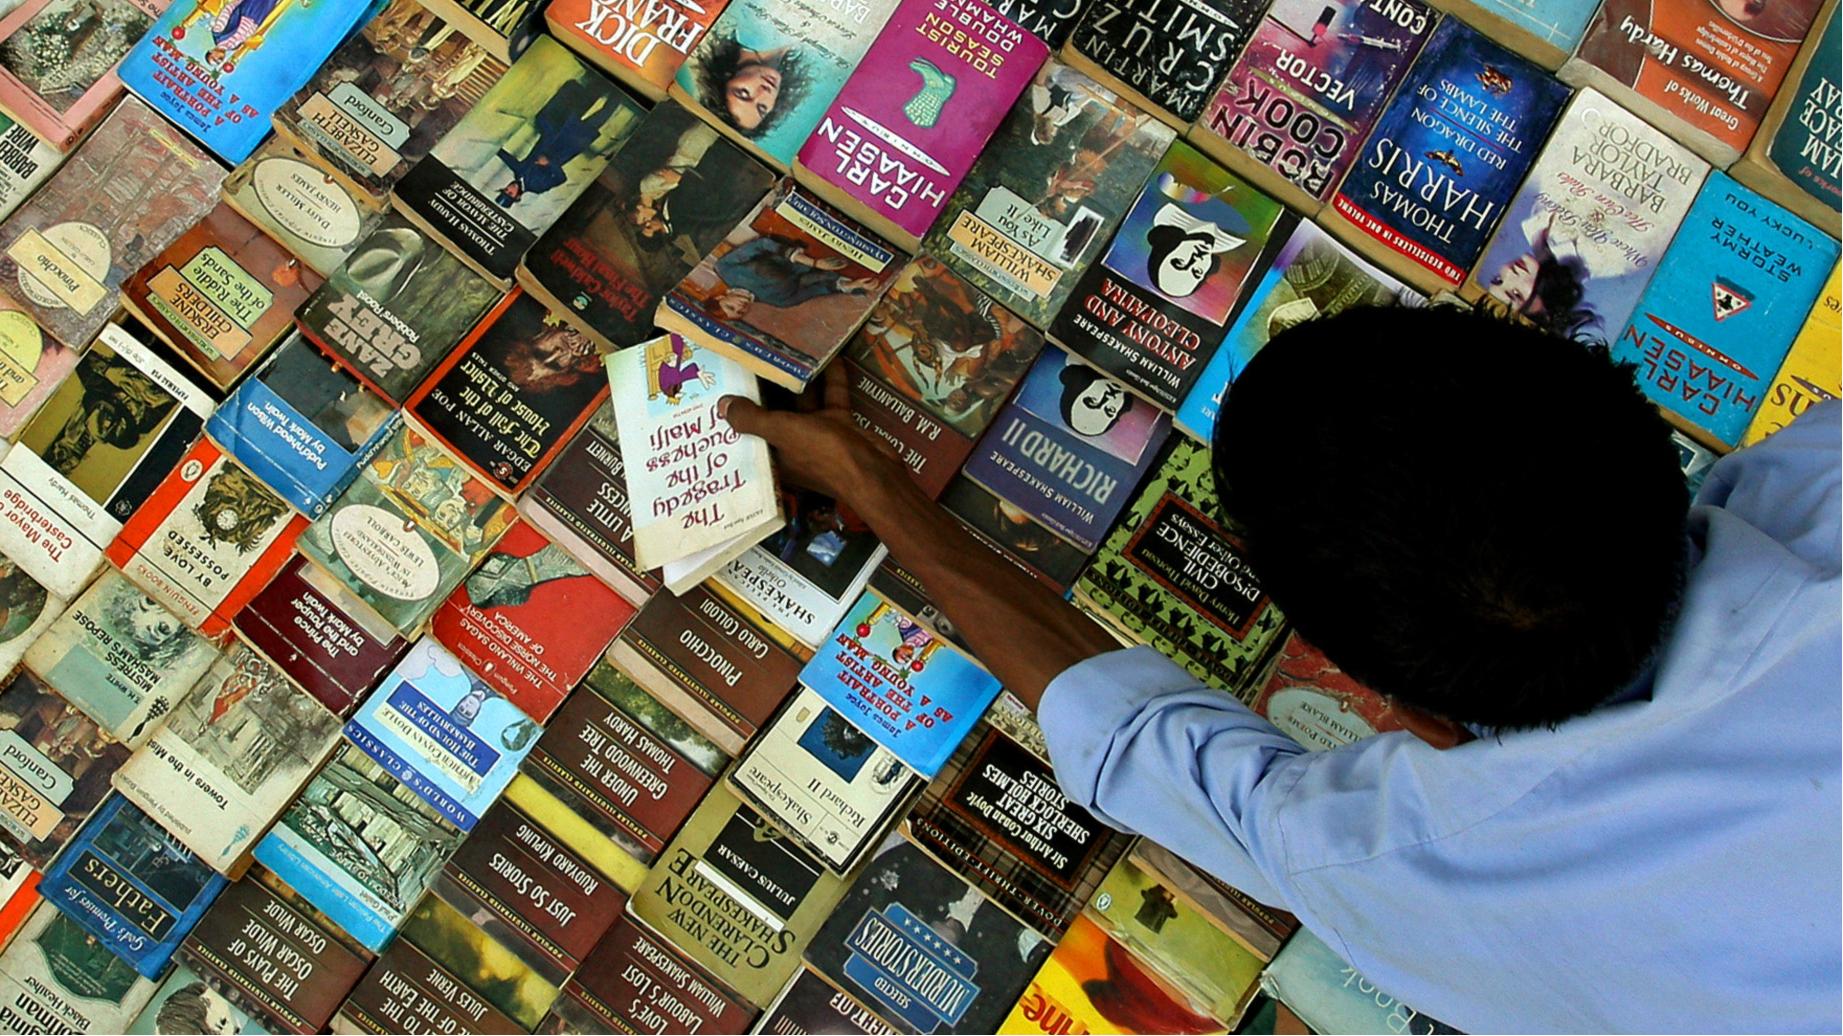 c-book-RTR1GJG2-Adnan Abidi